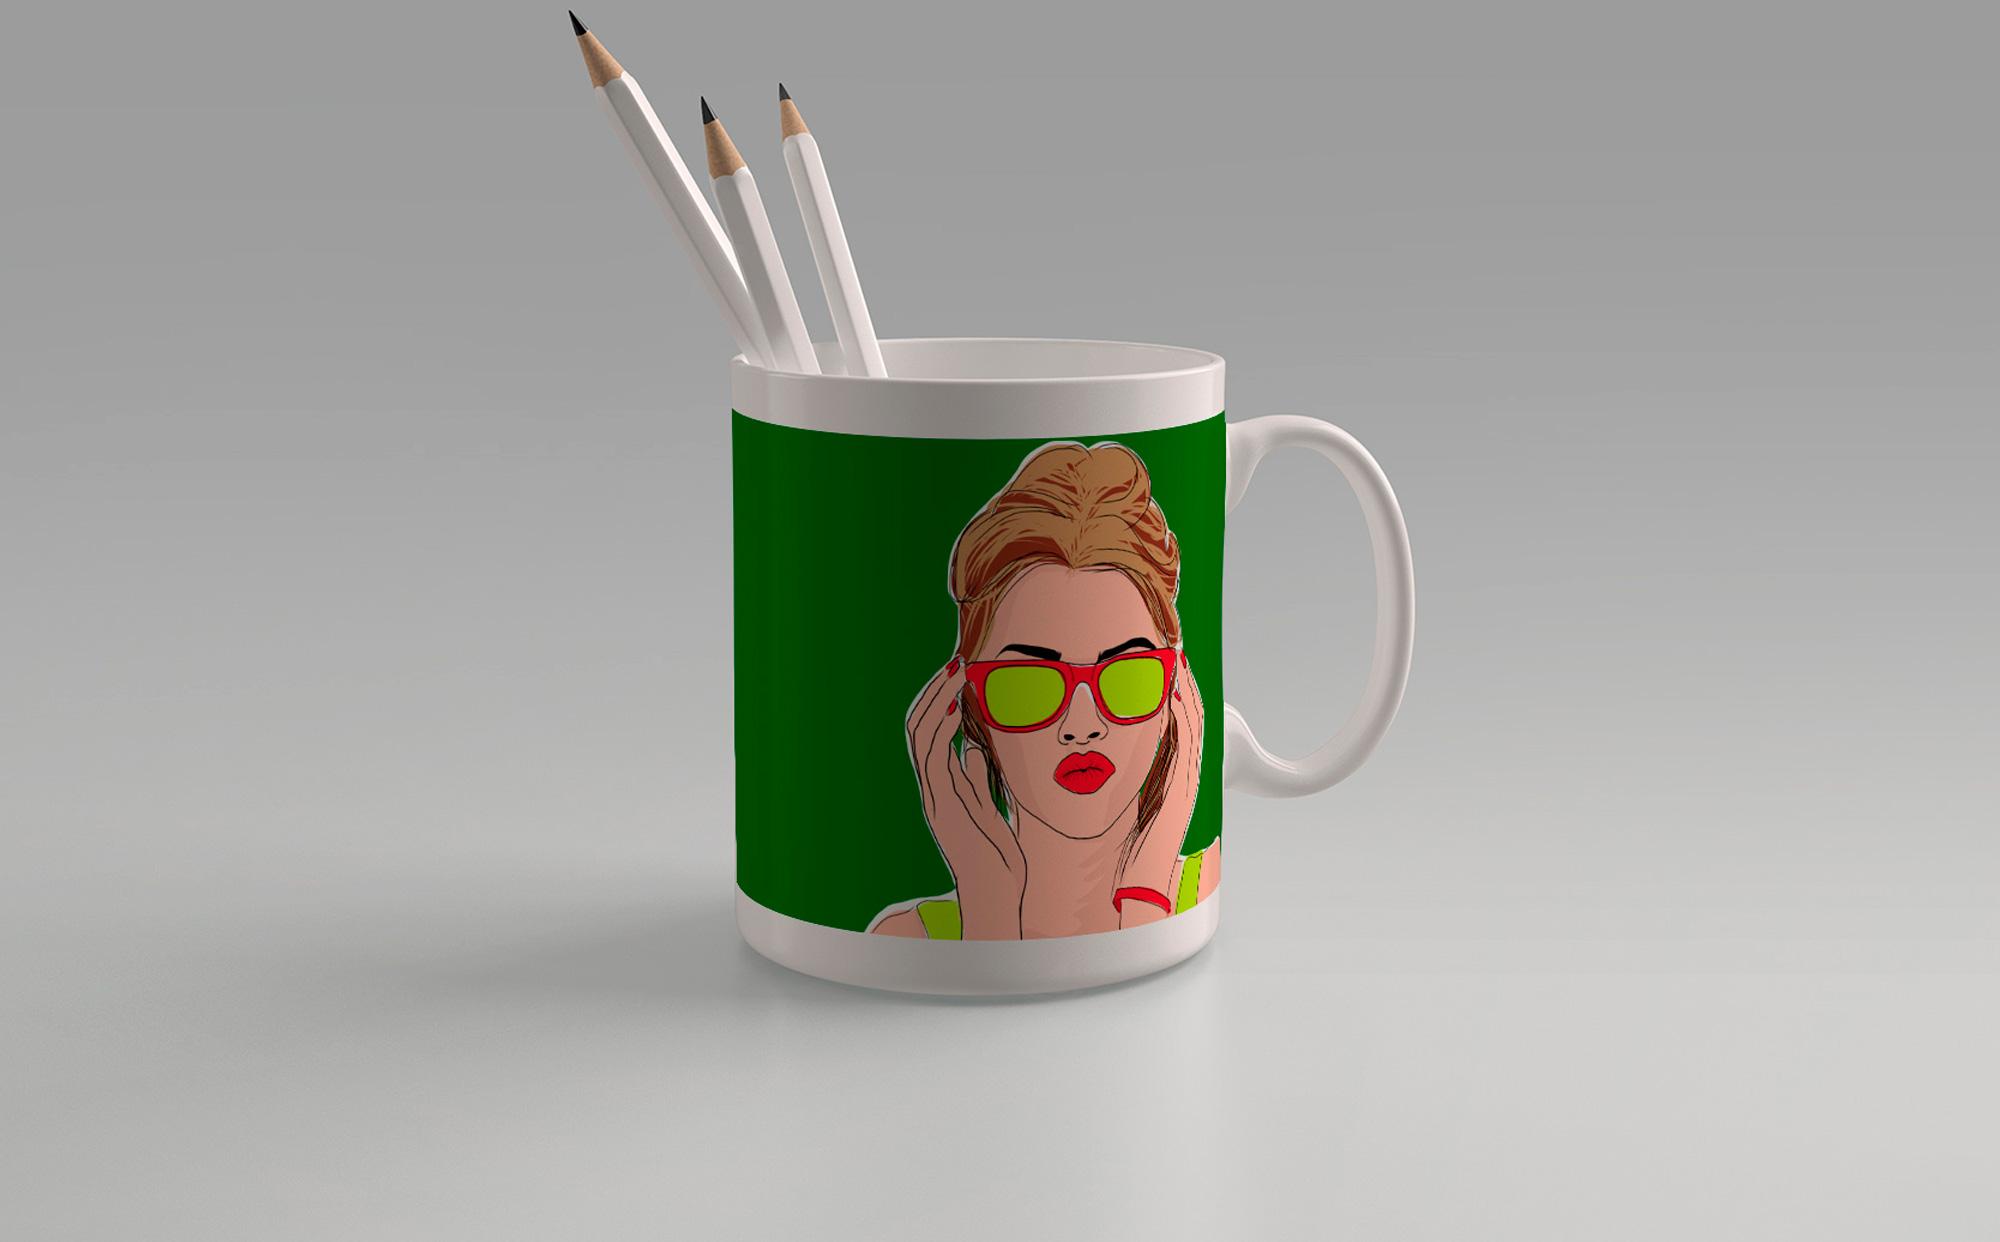 137mm Acero Inoxidable champ/án Amuzocity Art Pen Esp/átula De Caf/é Vajilla De Cocina Espumosa